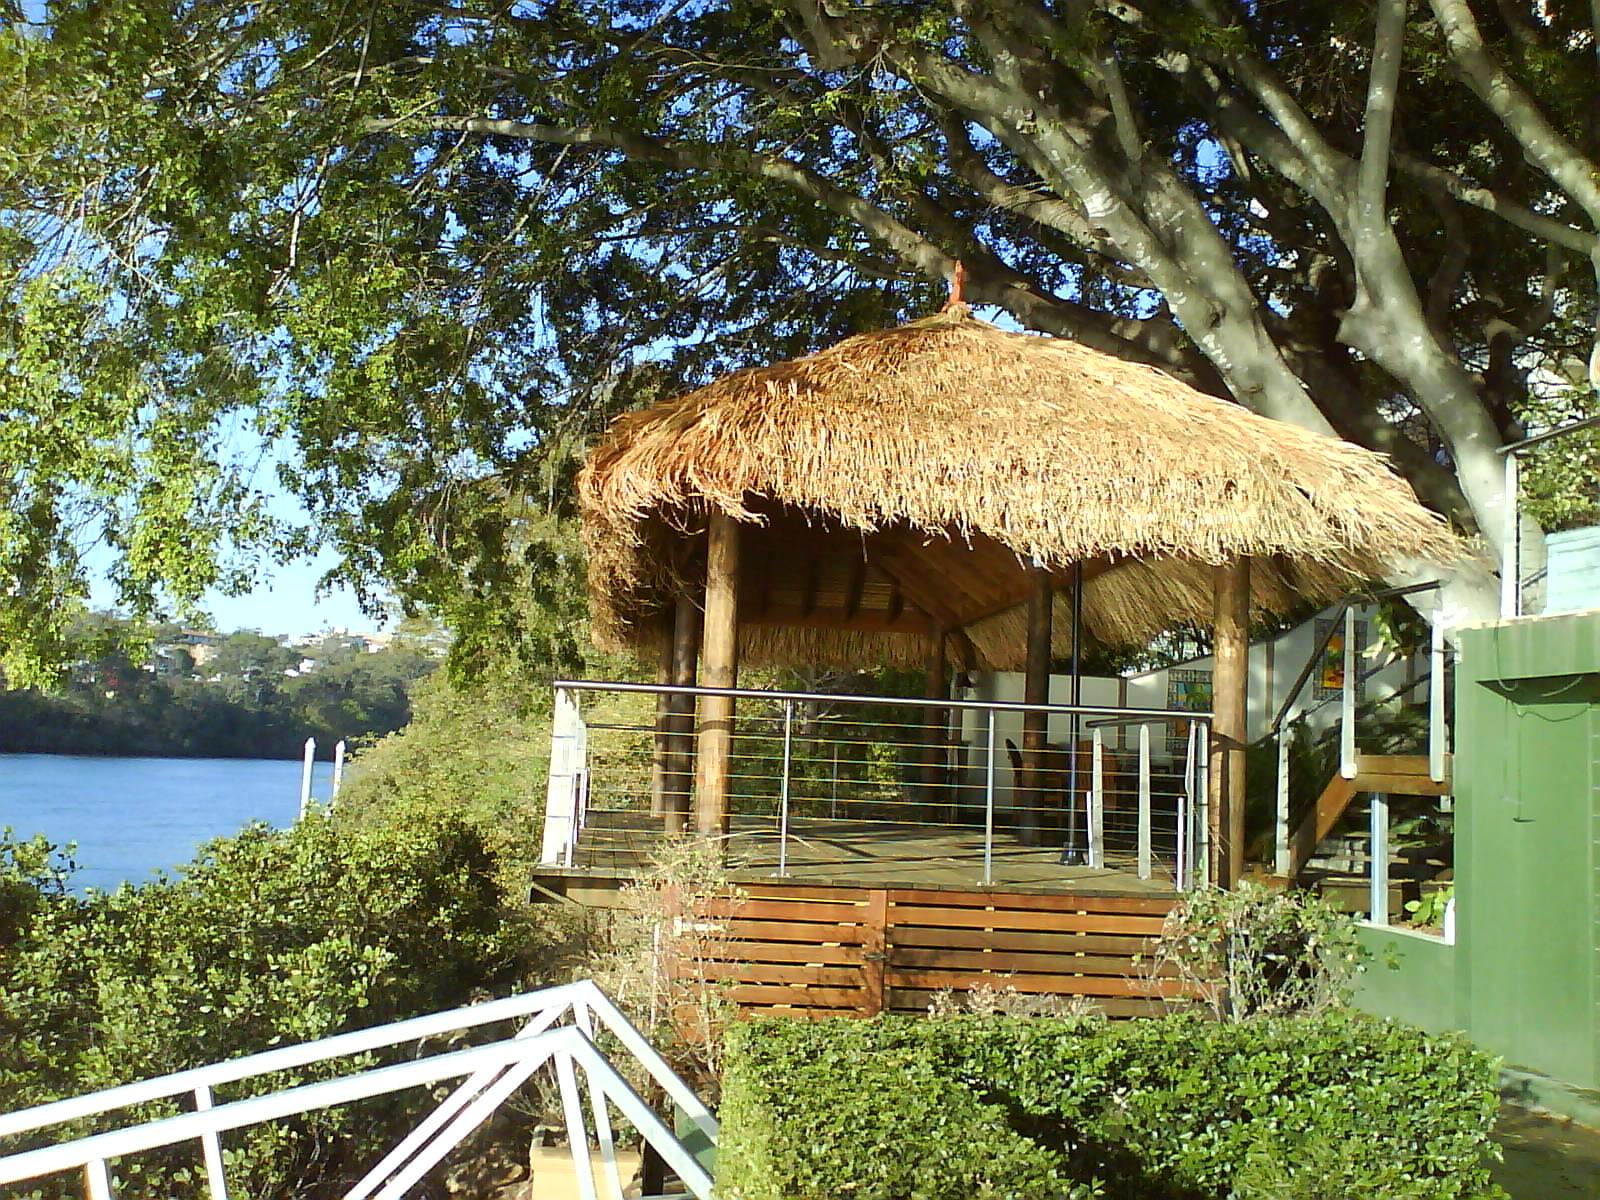 Brisbane Thatch -Bali Huts and Decks